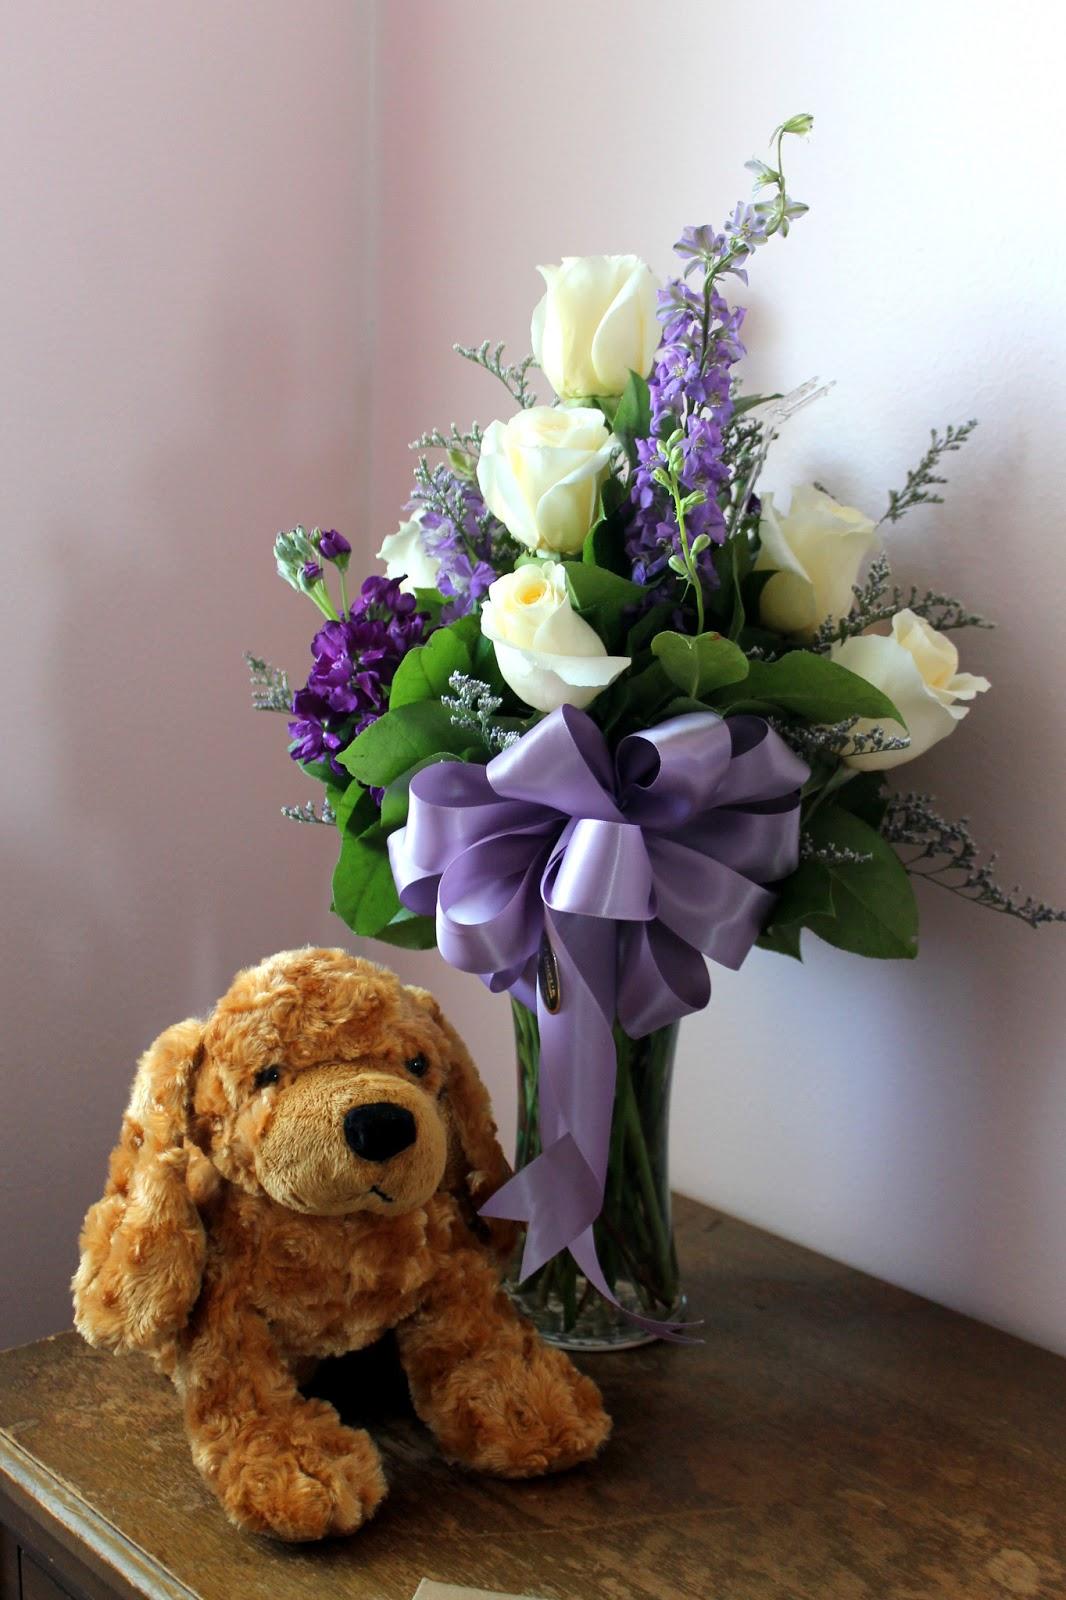 Sister flowers essay